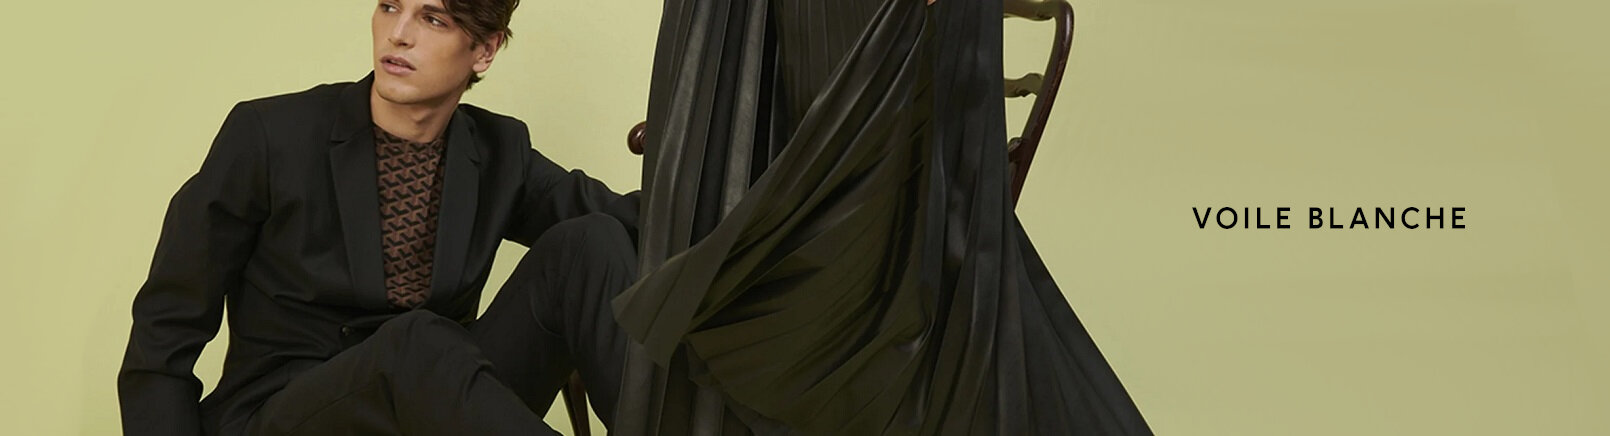 Voile Blanche Damenschuhe online entdecken im Juppen Shop